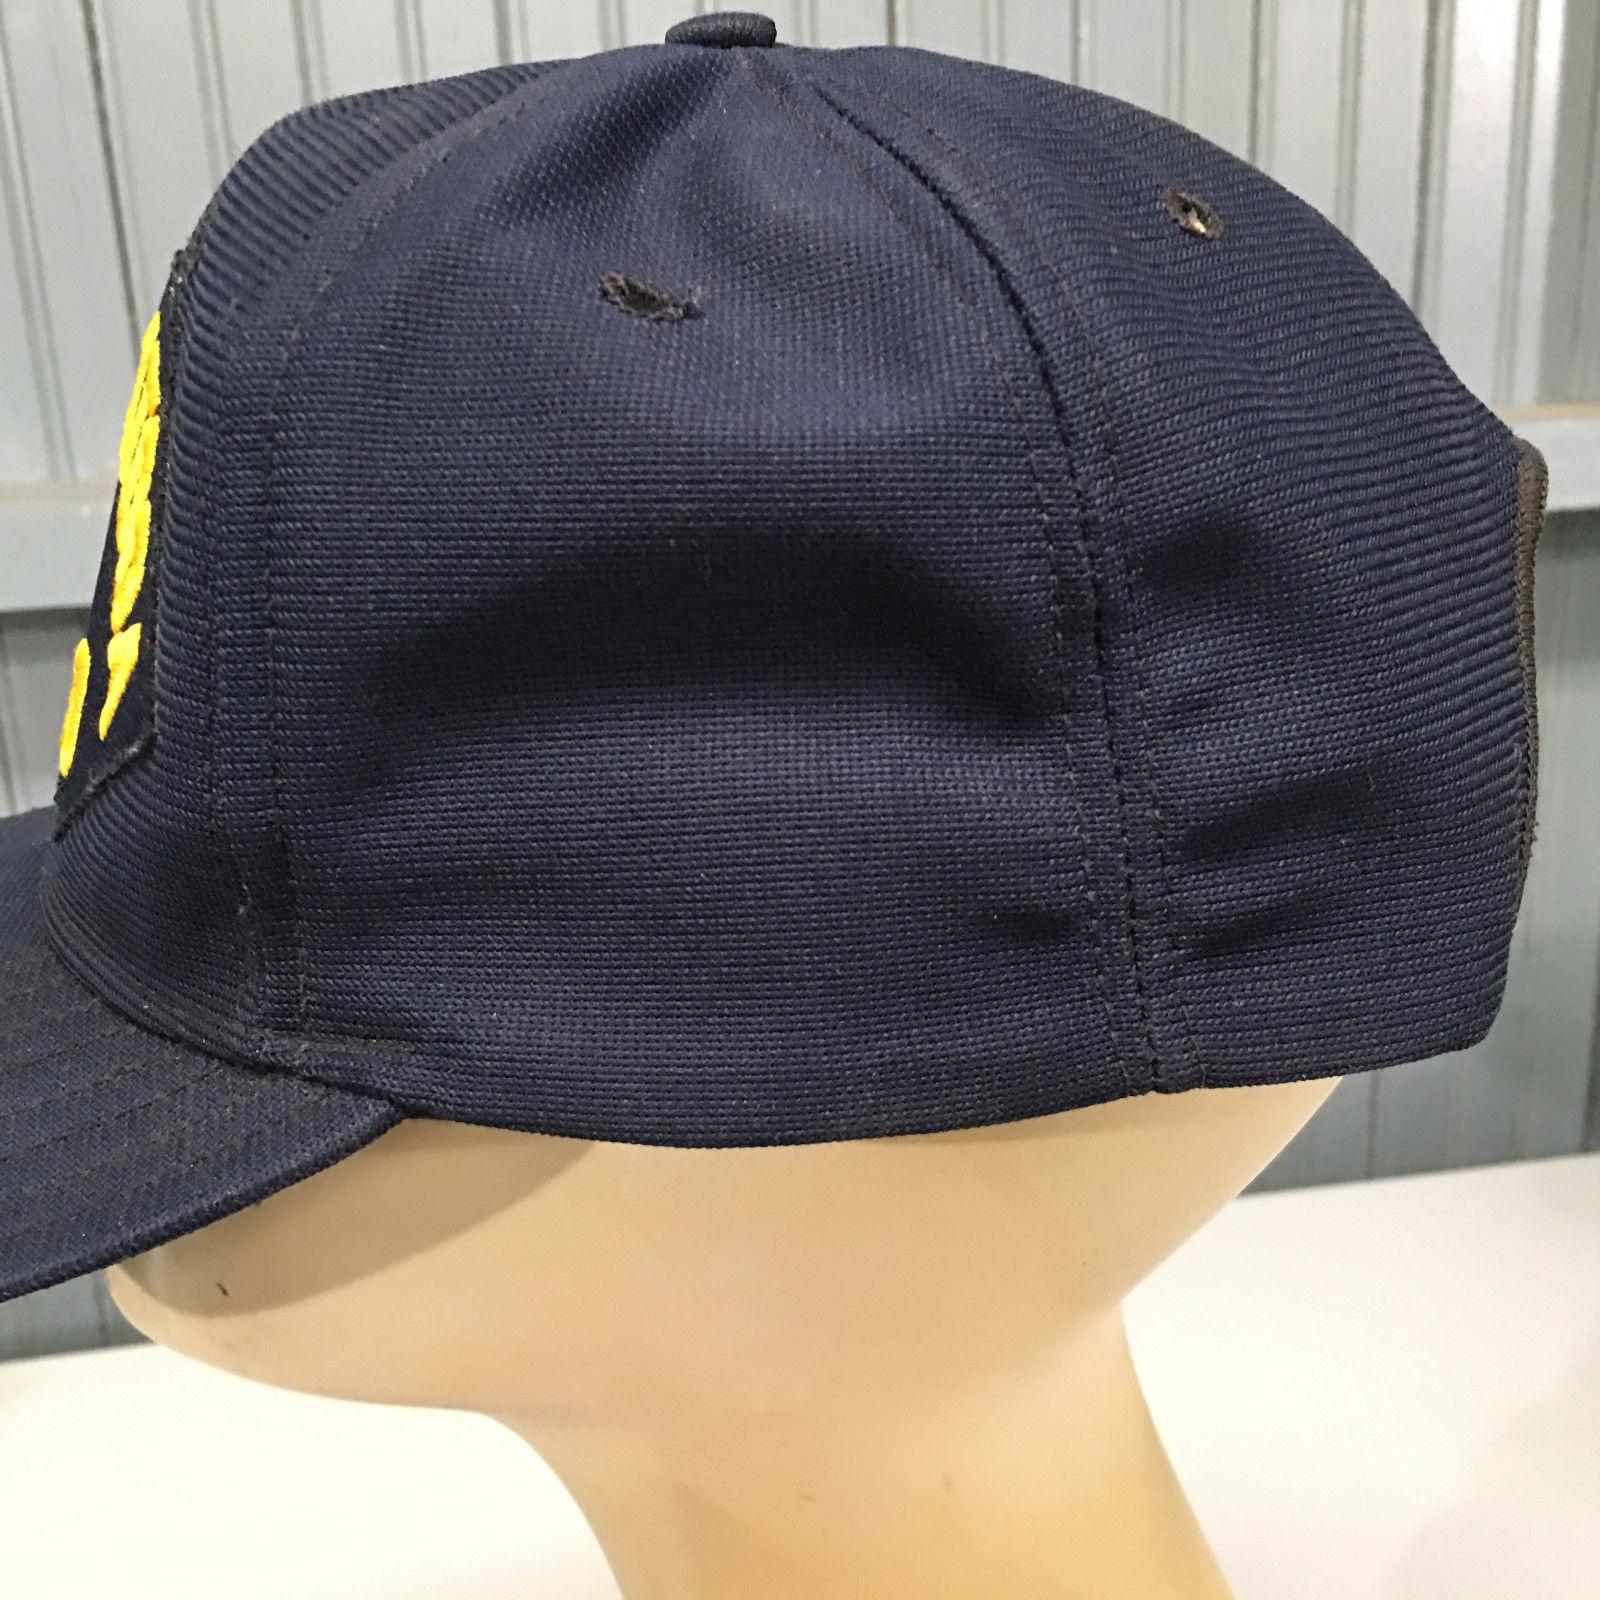 US Navy VTG USS Saratoga CV-60 Baseball Cap Hat Snapback Military Made in USA